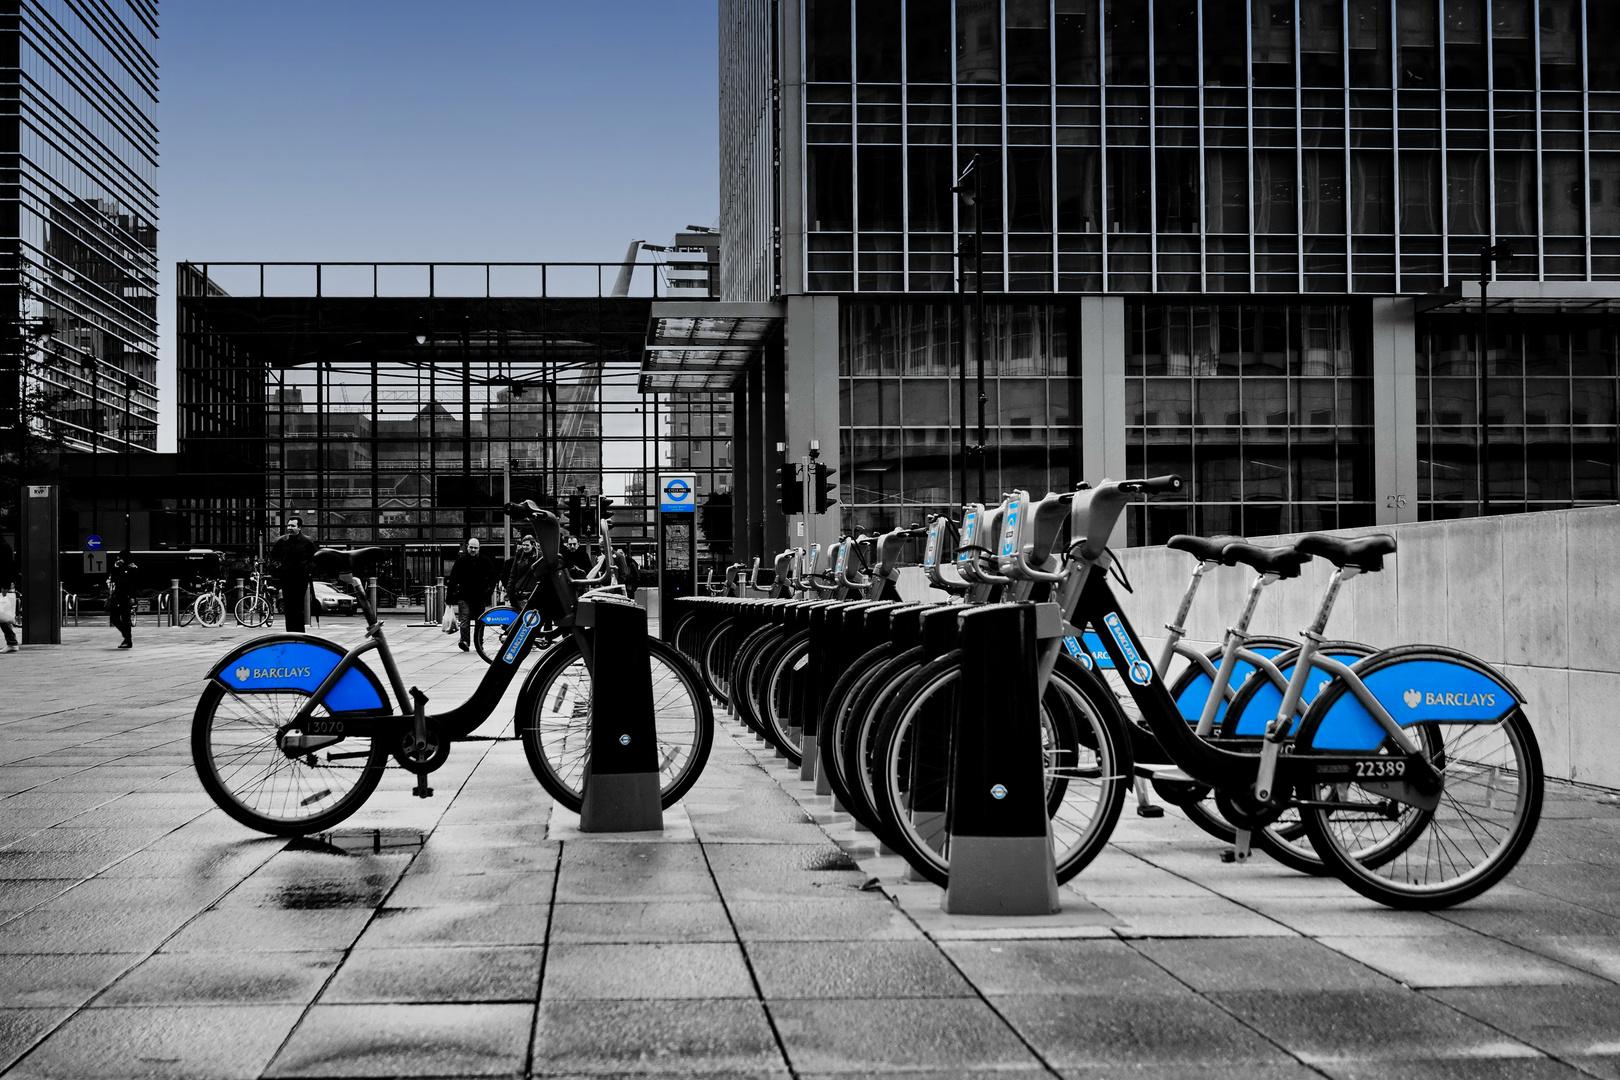 The Barclay Bank Bikes